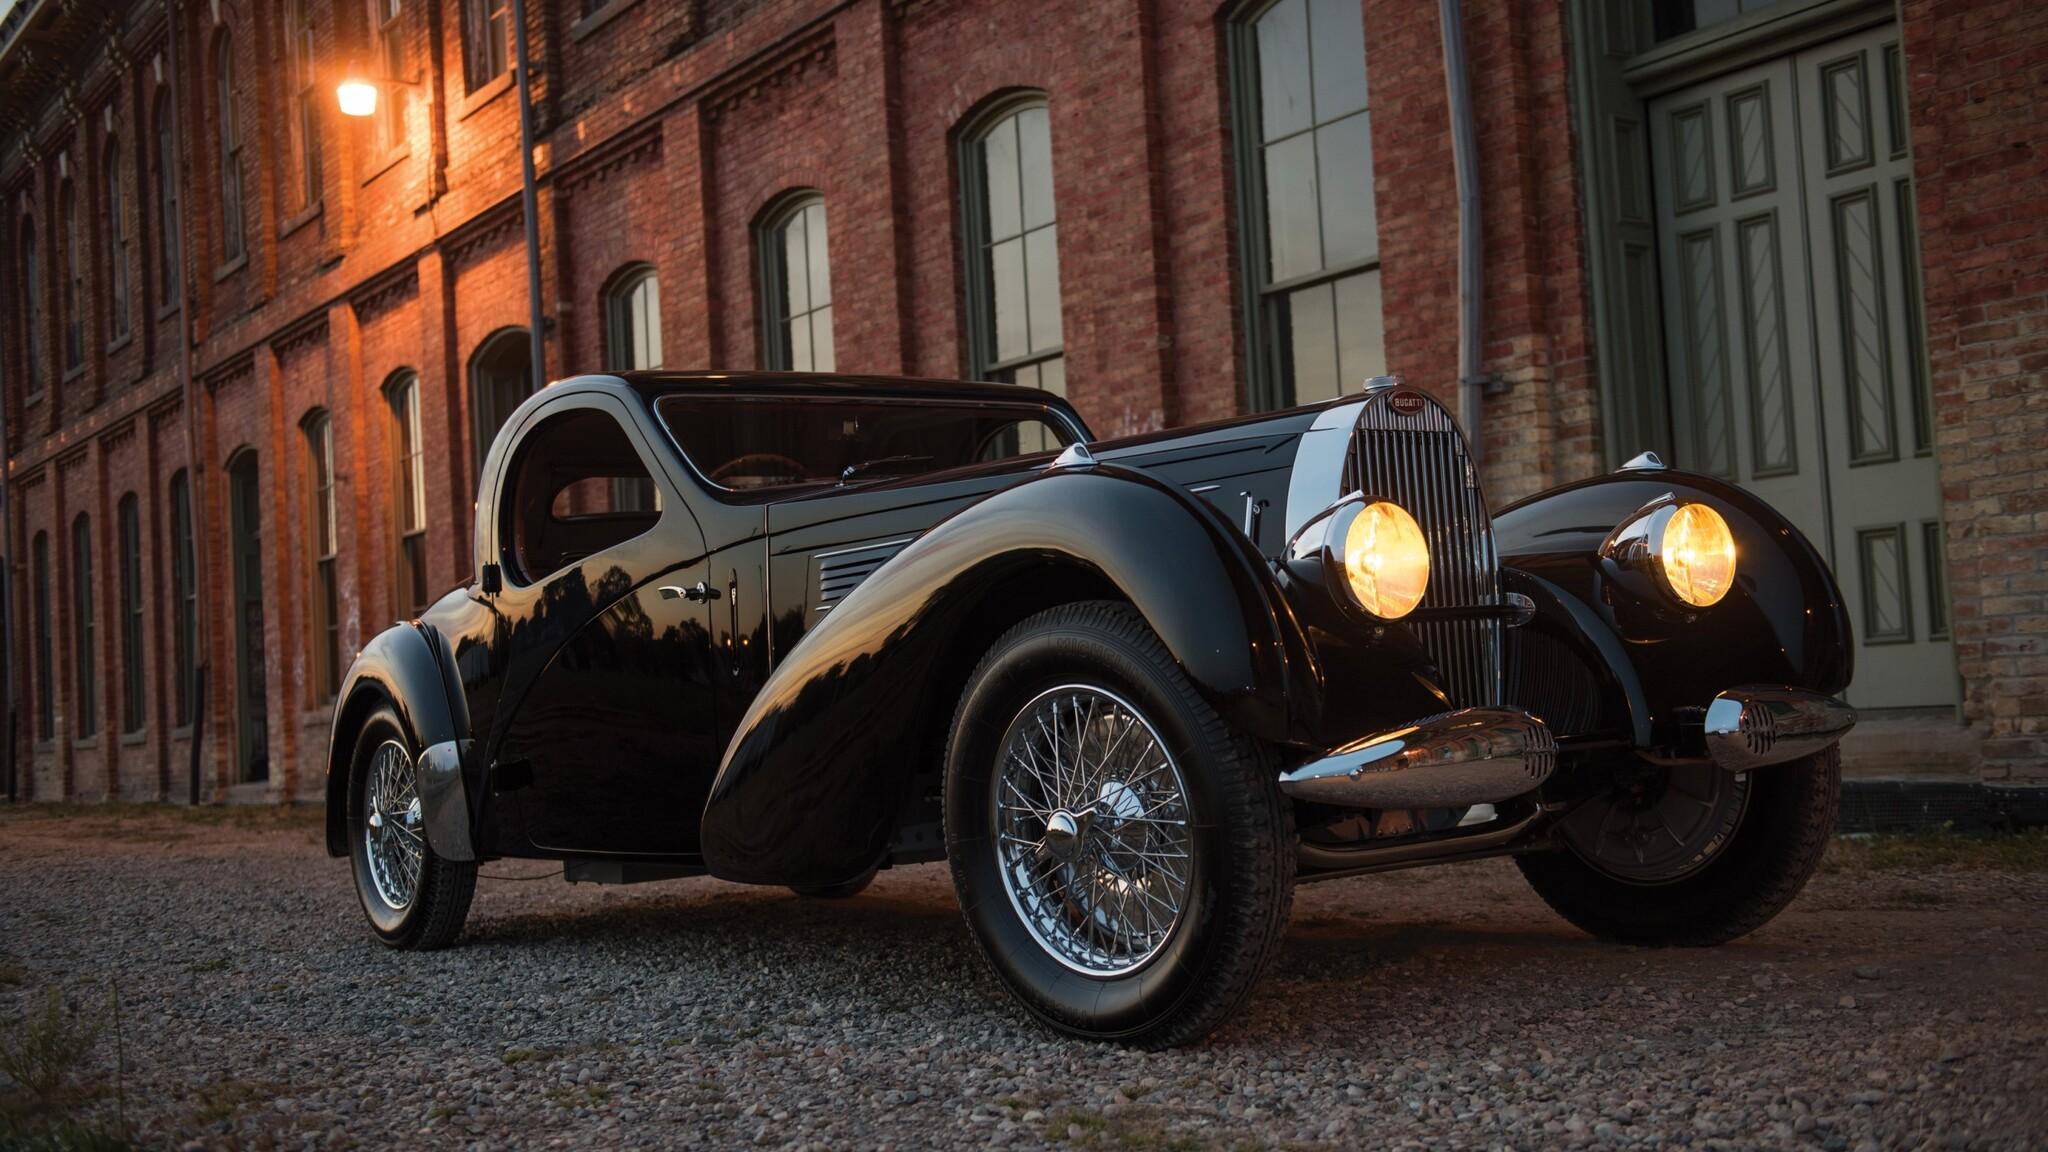 2048x1152 Bugatti Vintage Car 2048x1152 Resolution Hd 4k Wallpapers